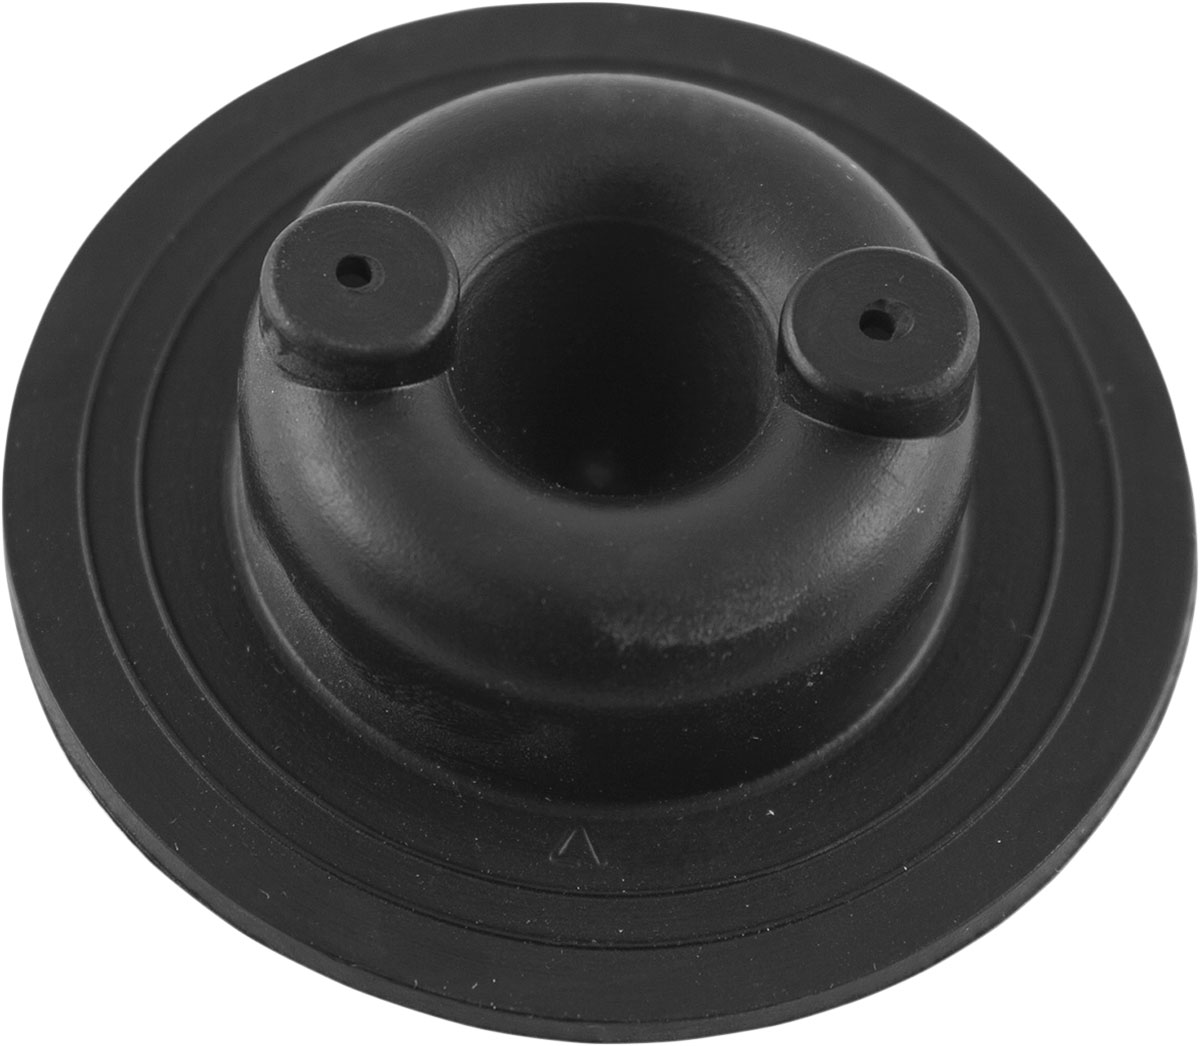 ACERBIS Replacement Gasket for Acerbis Large Gas Cap (2044170001)